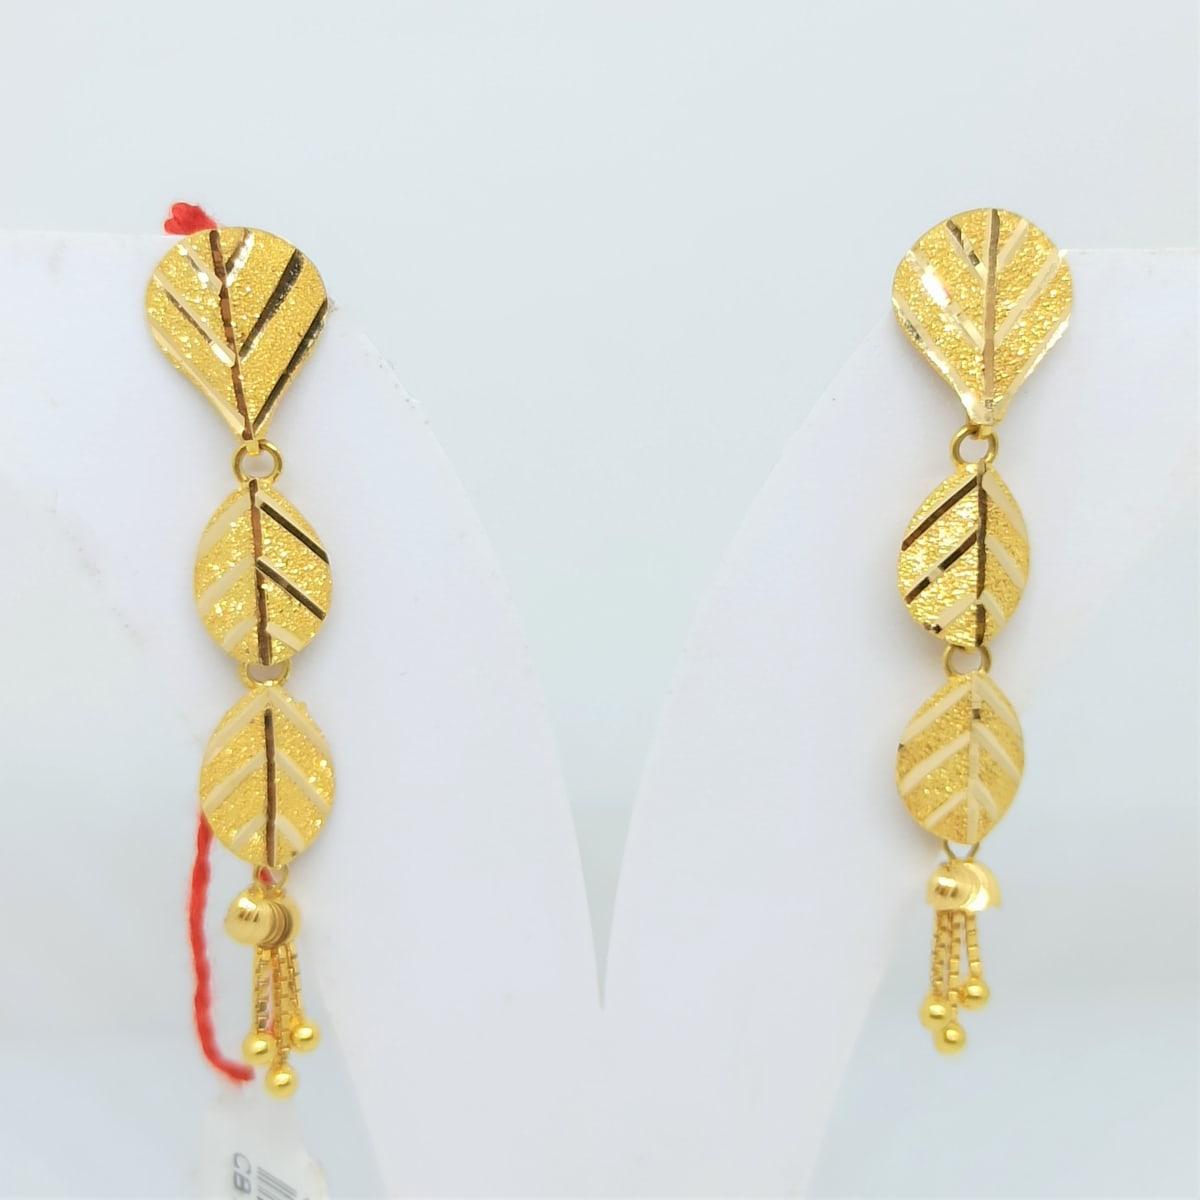 Plain Gold Leaf Earrings